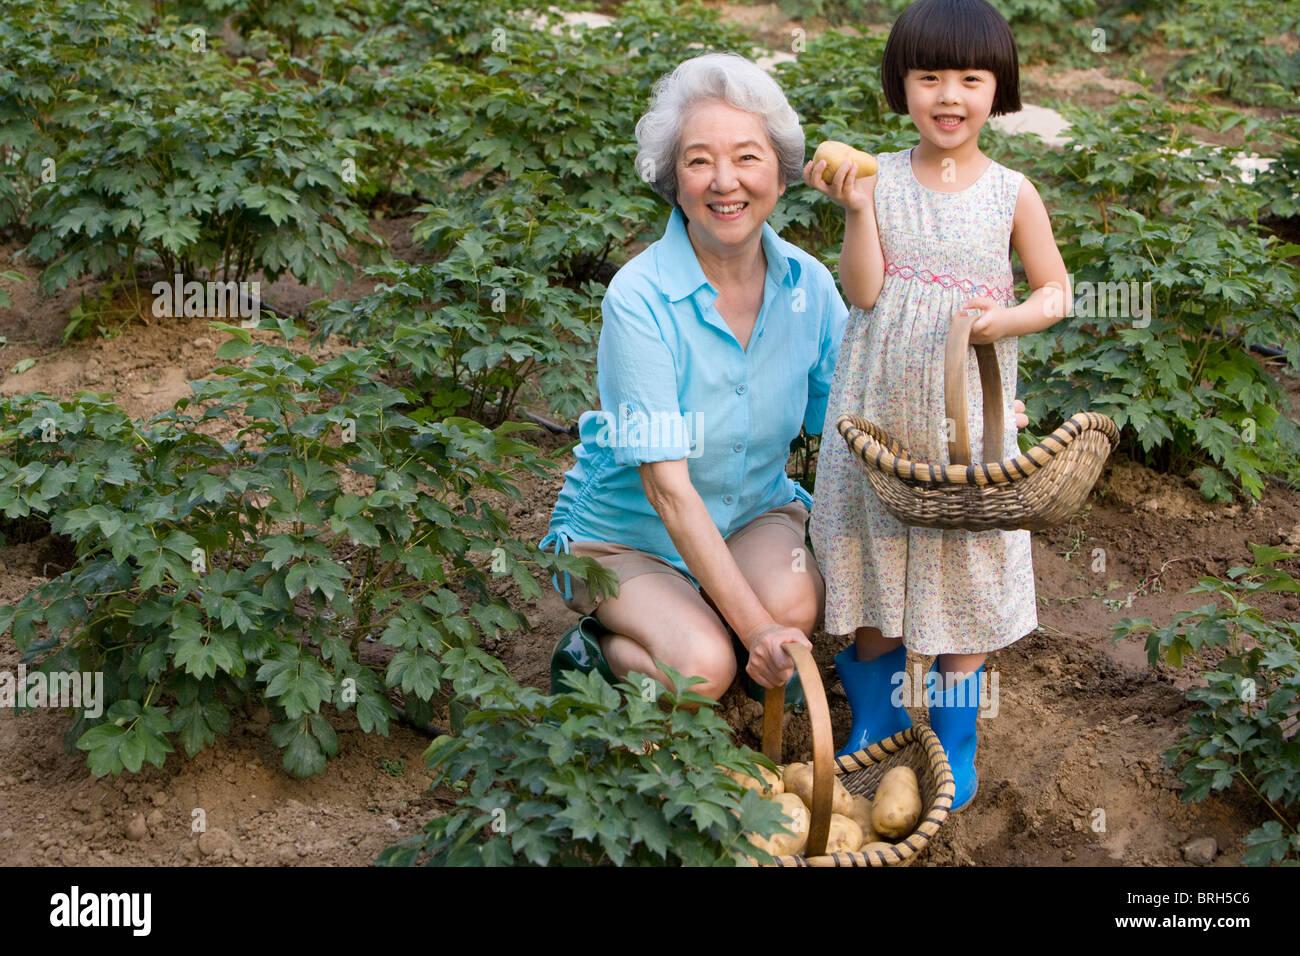 Superior Grandma And Granddaughter Gardening   Stock Image